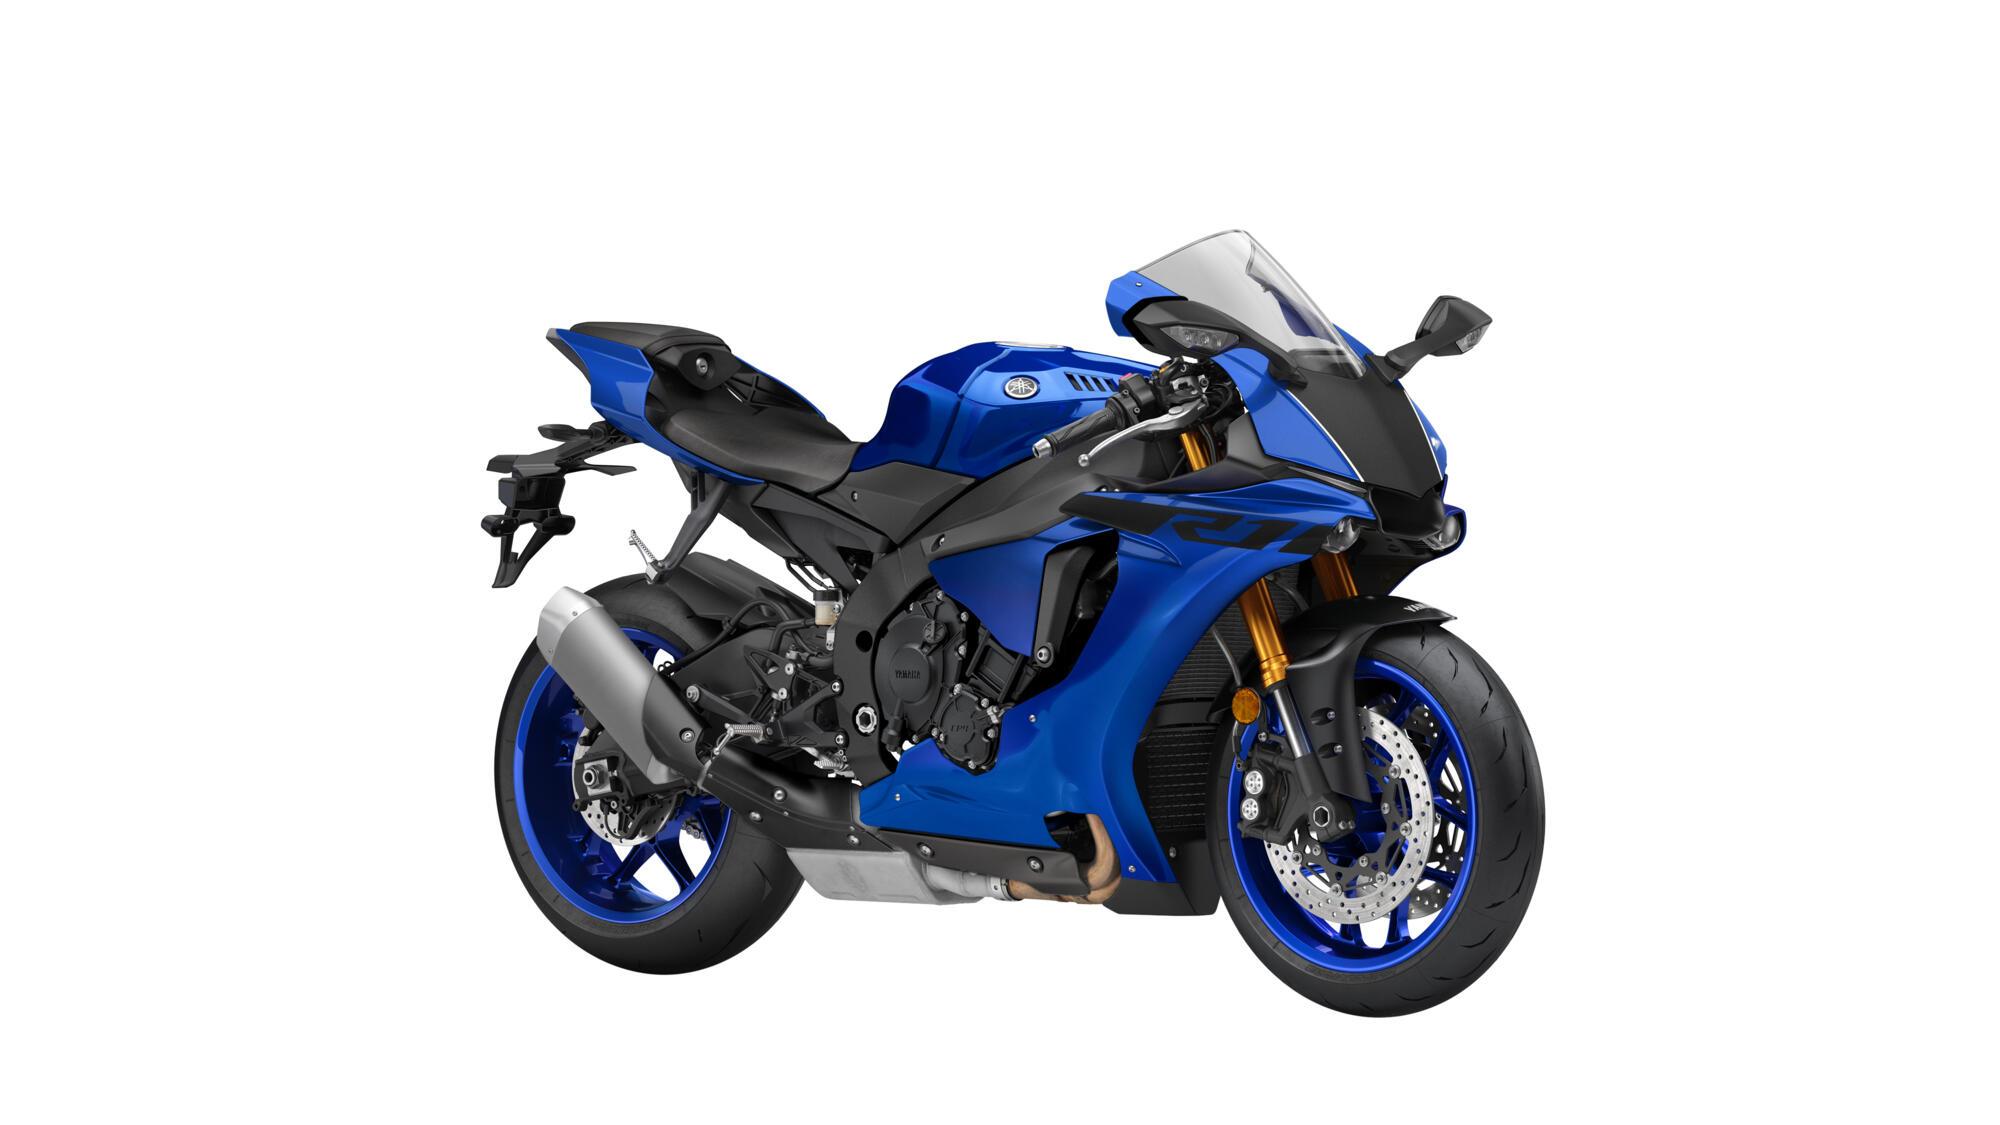 hight resolution of yzf r1 motorcycles yme website rh yamaha motor eu 2012 service manual 2012 yzf r1